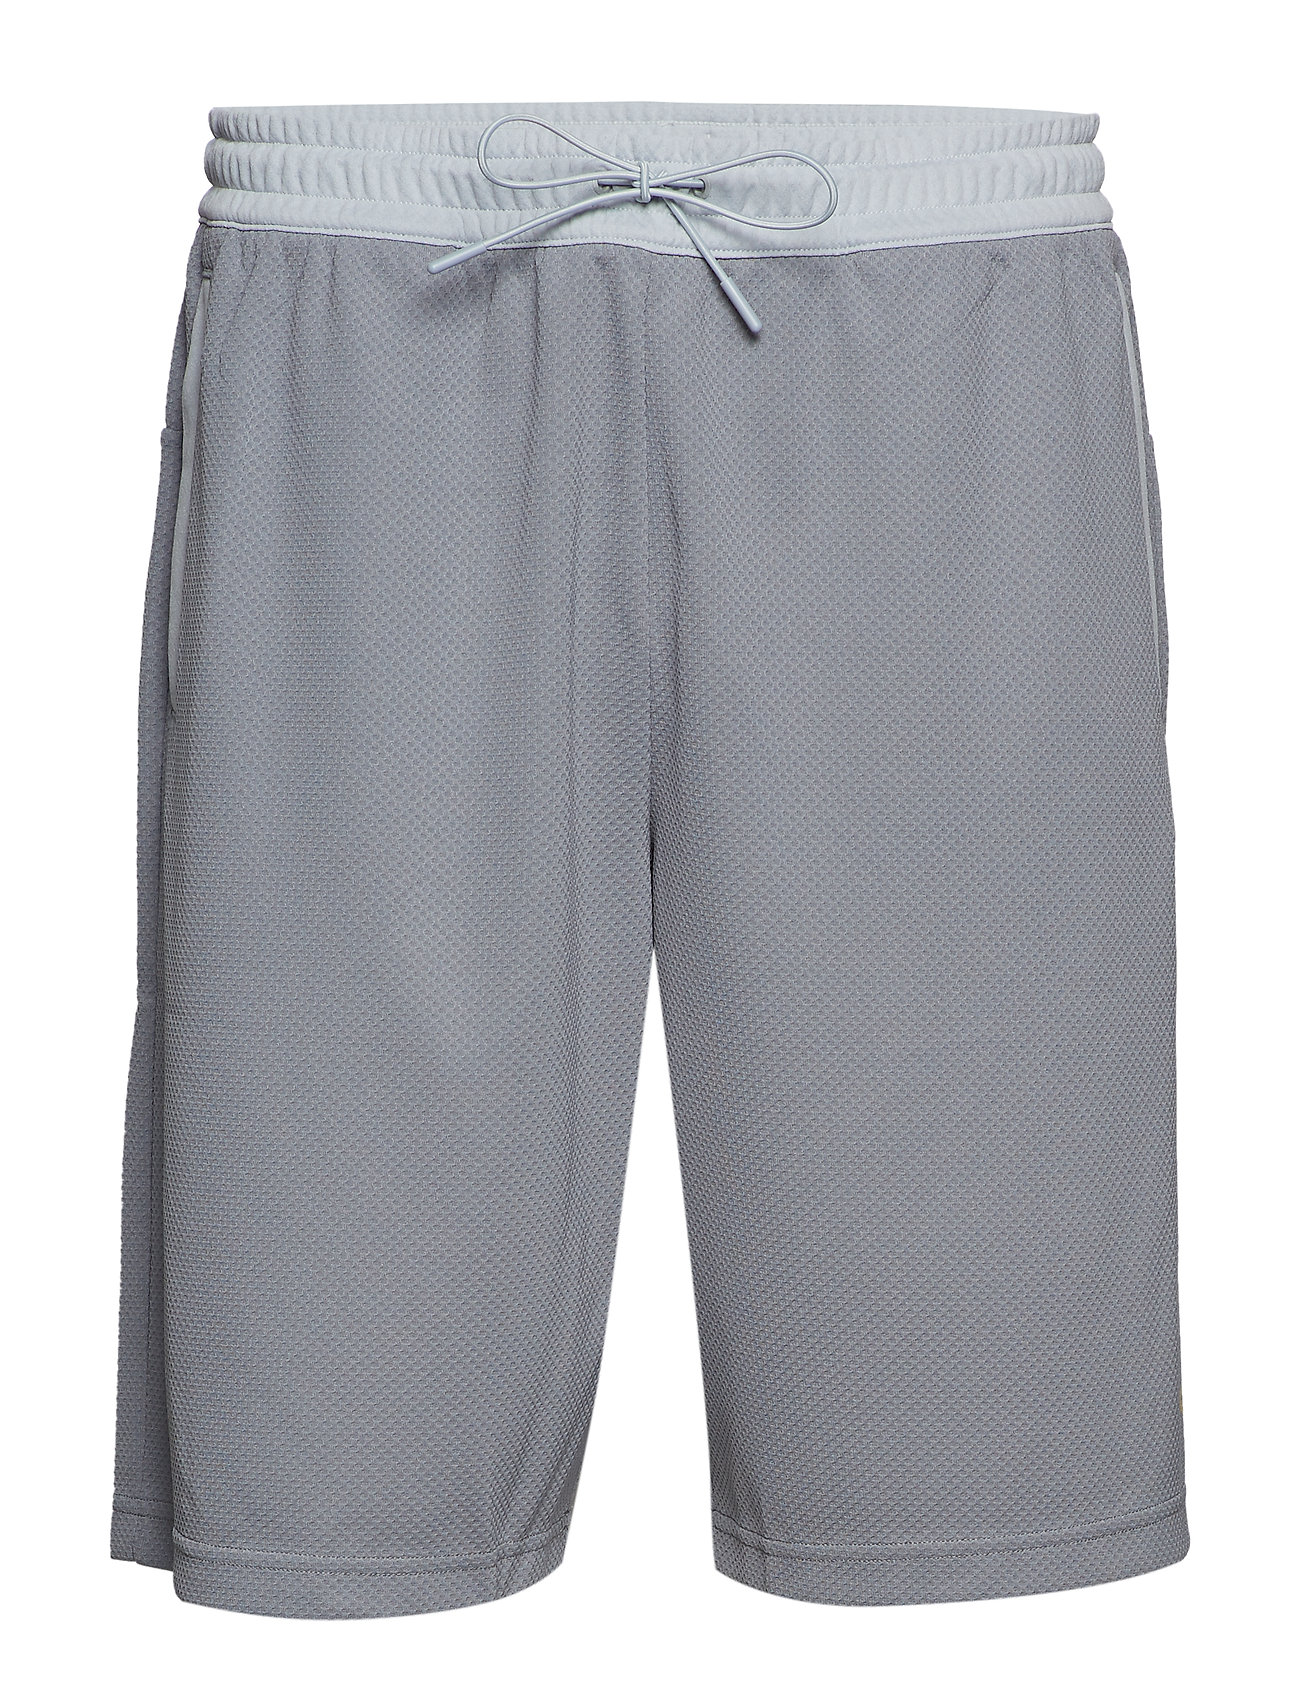 00269f2faff Calvin Klein bermuda shorts – Mesh Short til herre i MONUMENT/PEARL ...